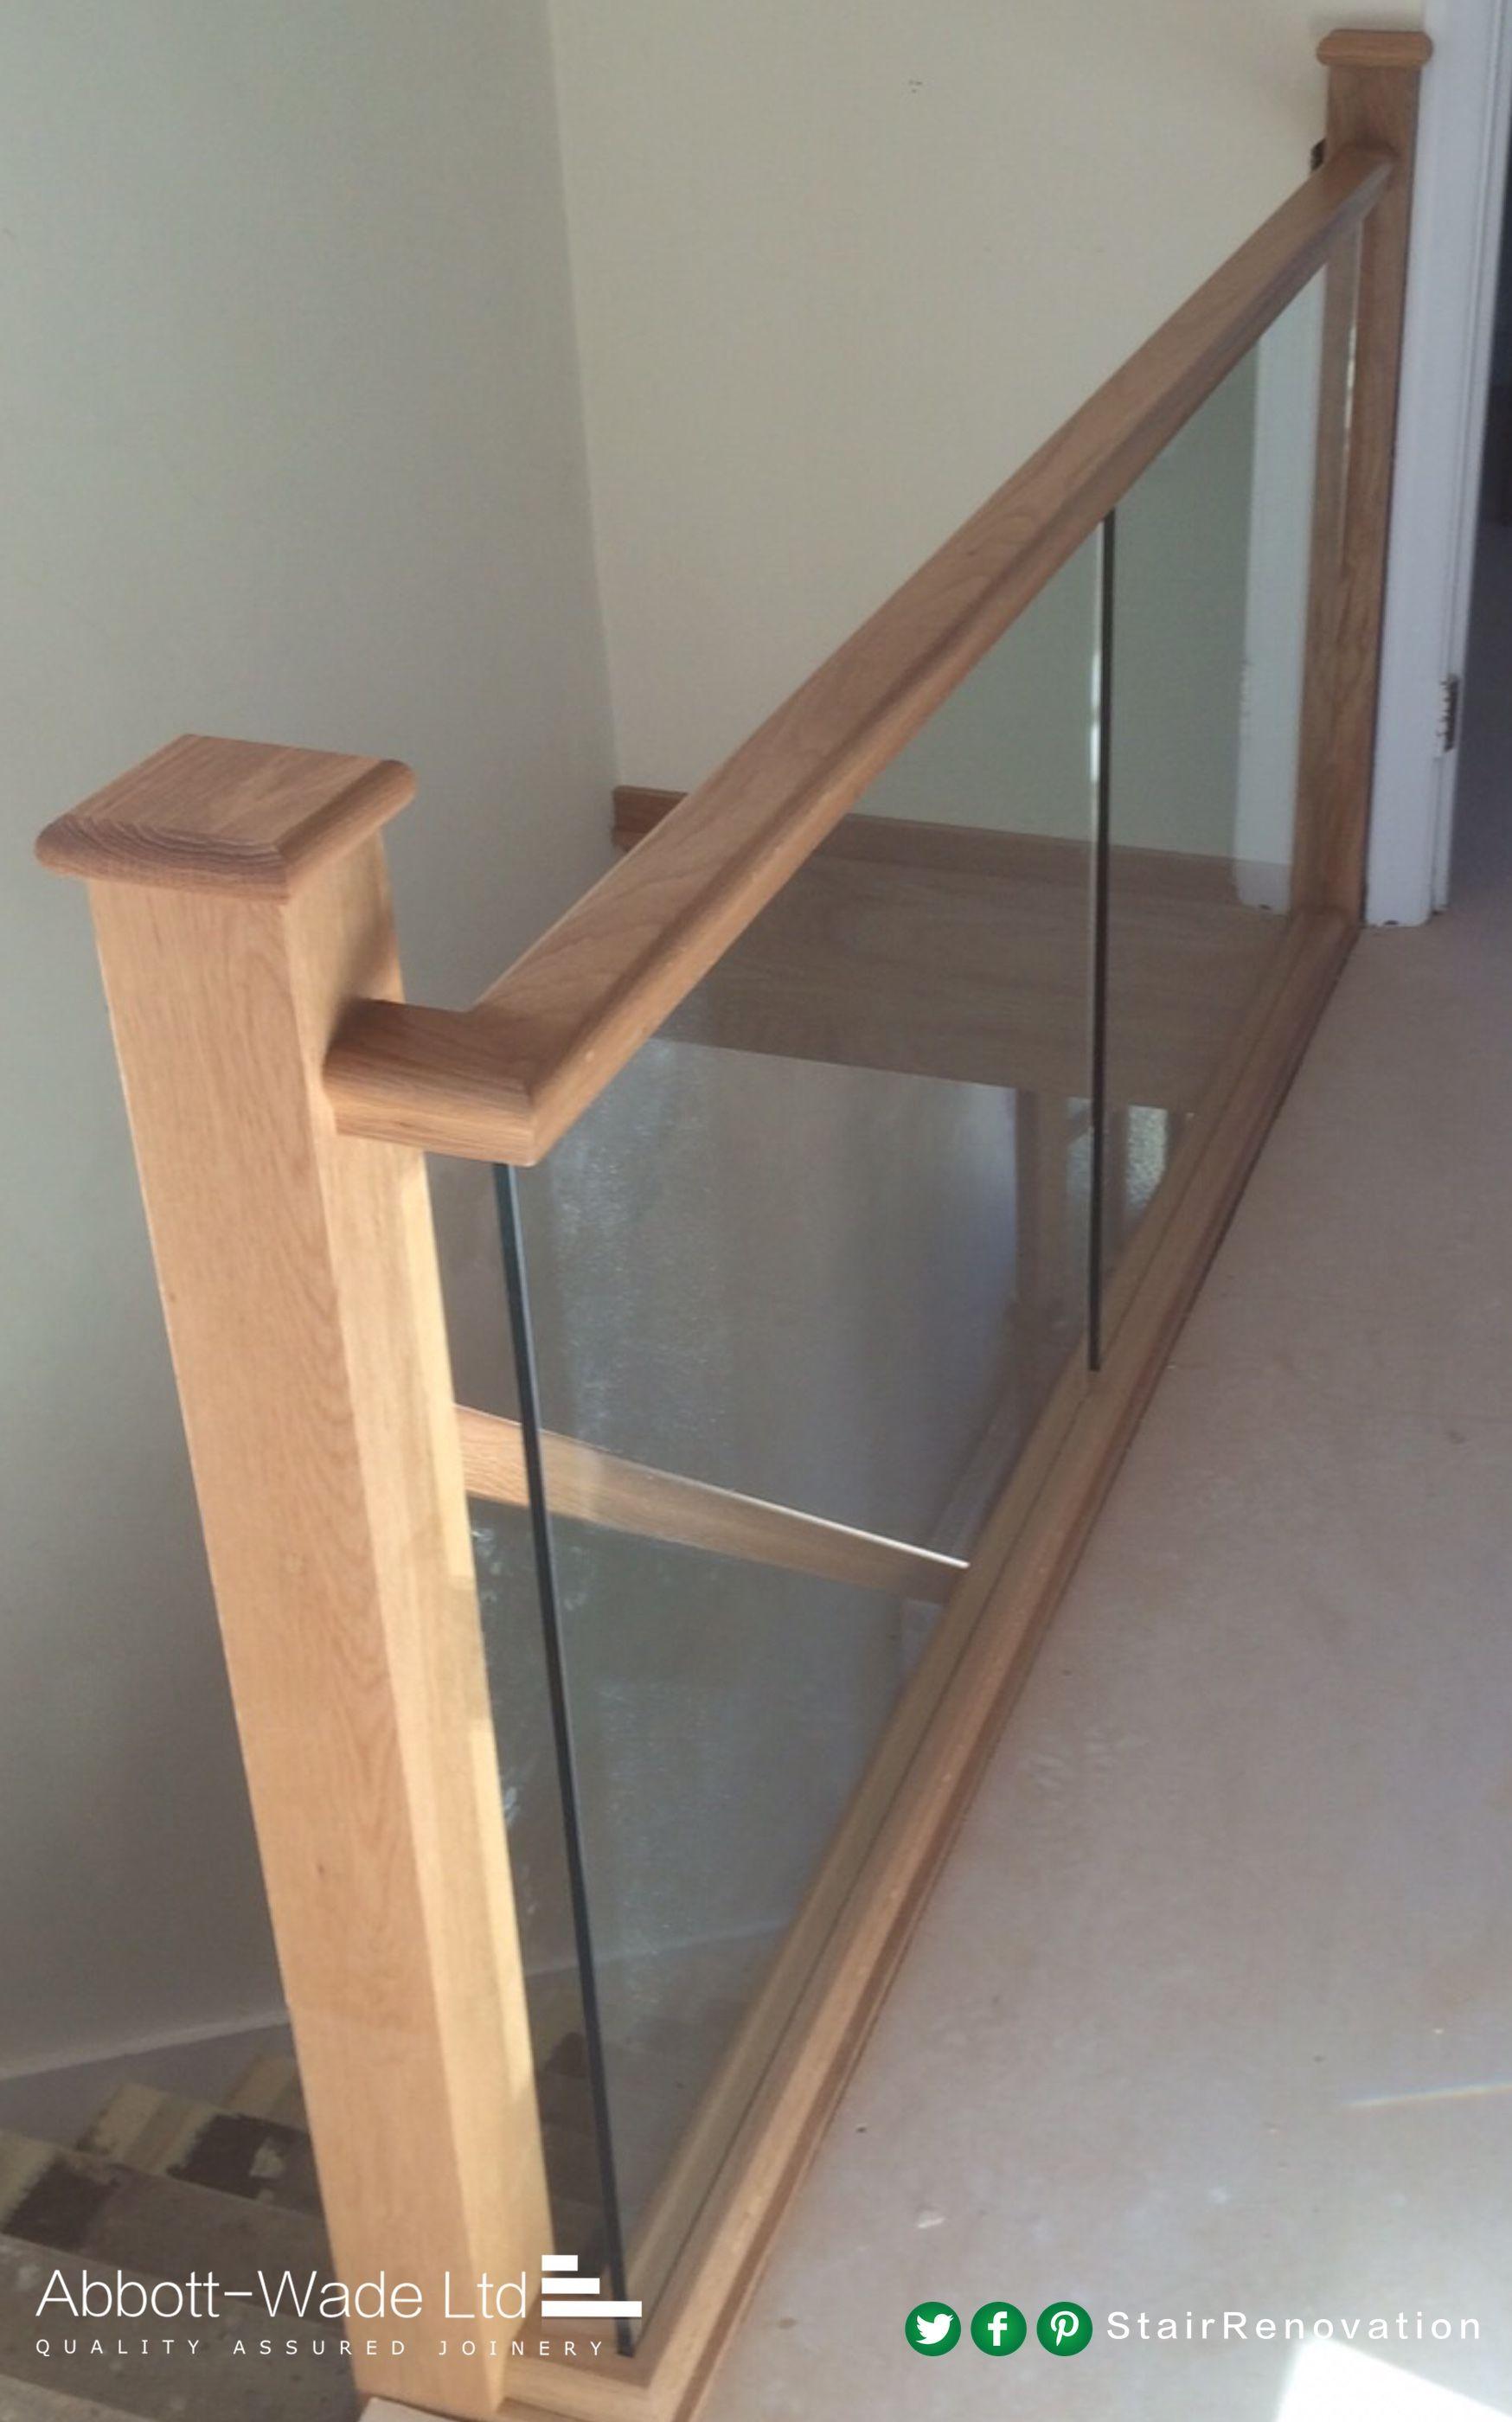 Best Abbott Wade Oak Staircase With Inline Glass Balustrade 400 x 300